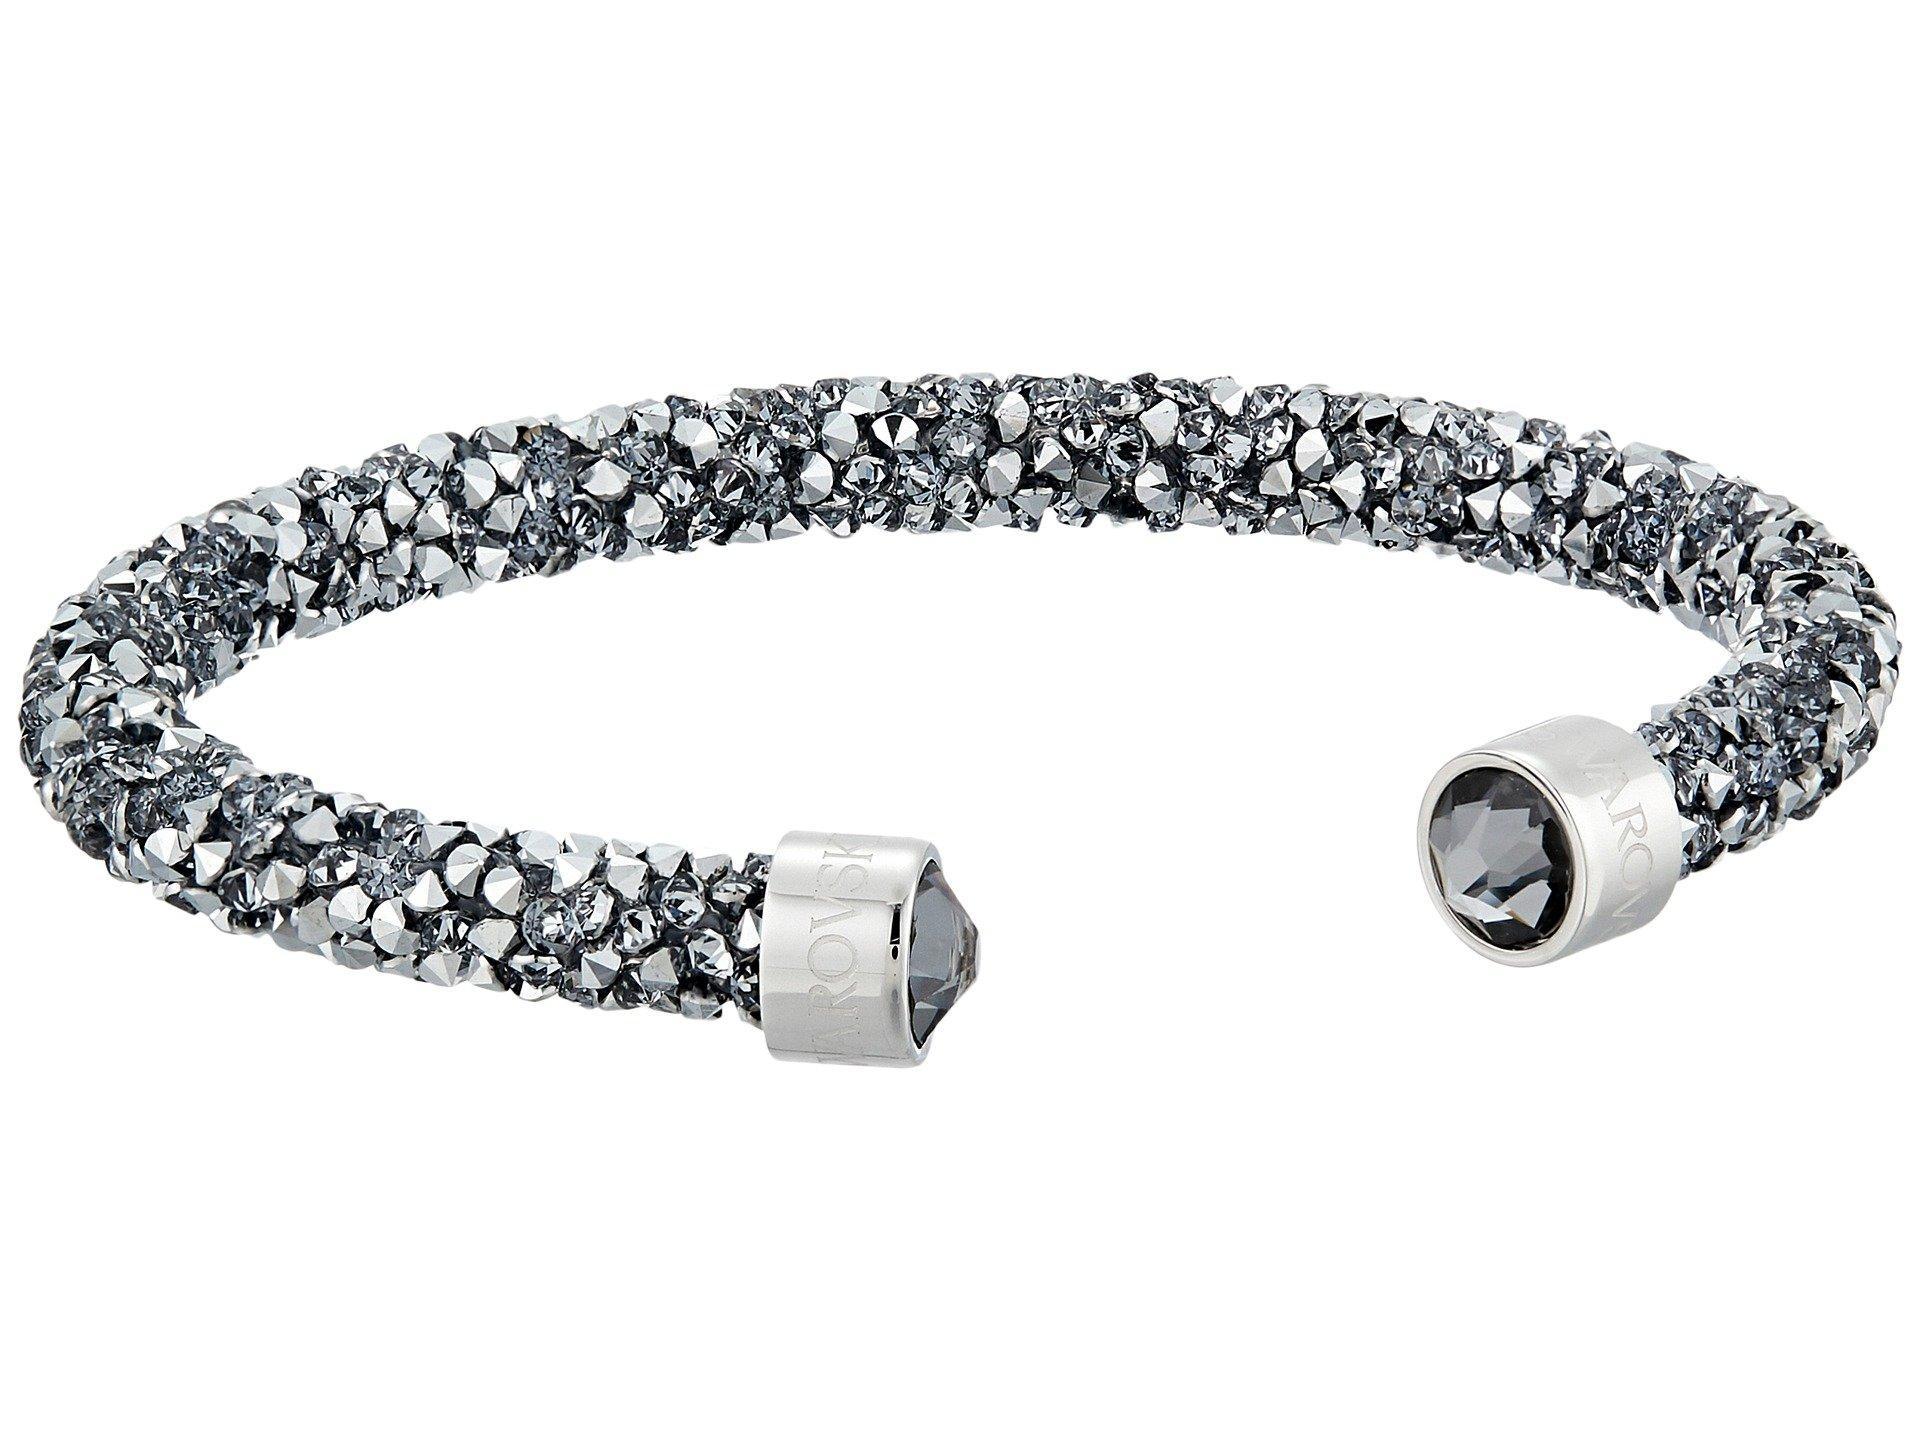 651777619b050 Women's Metallic Crystaldust Cuff Bracelet